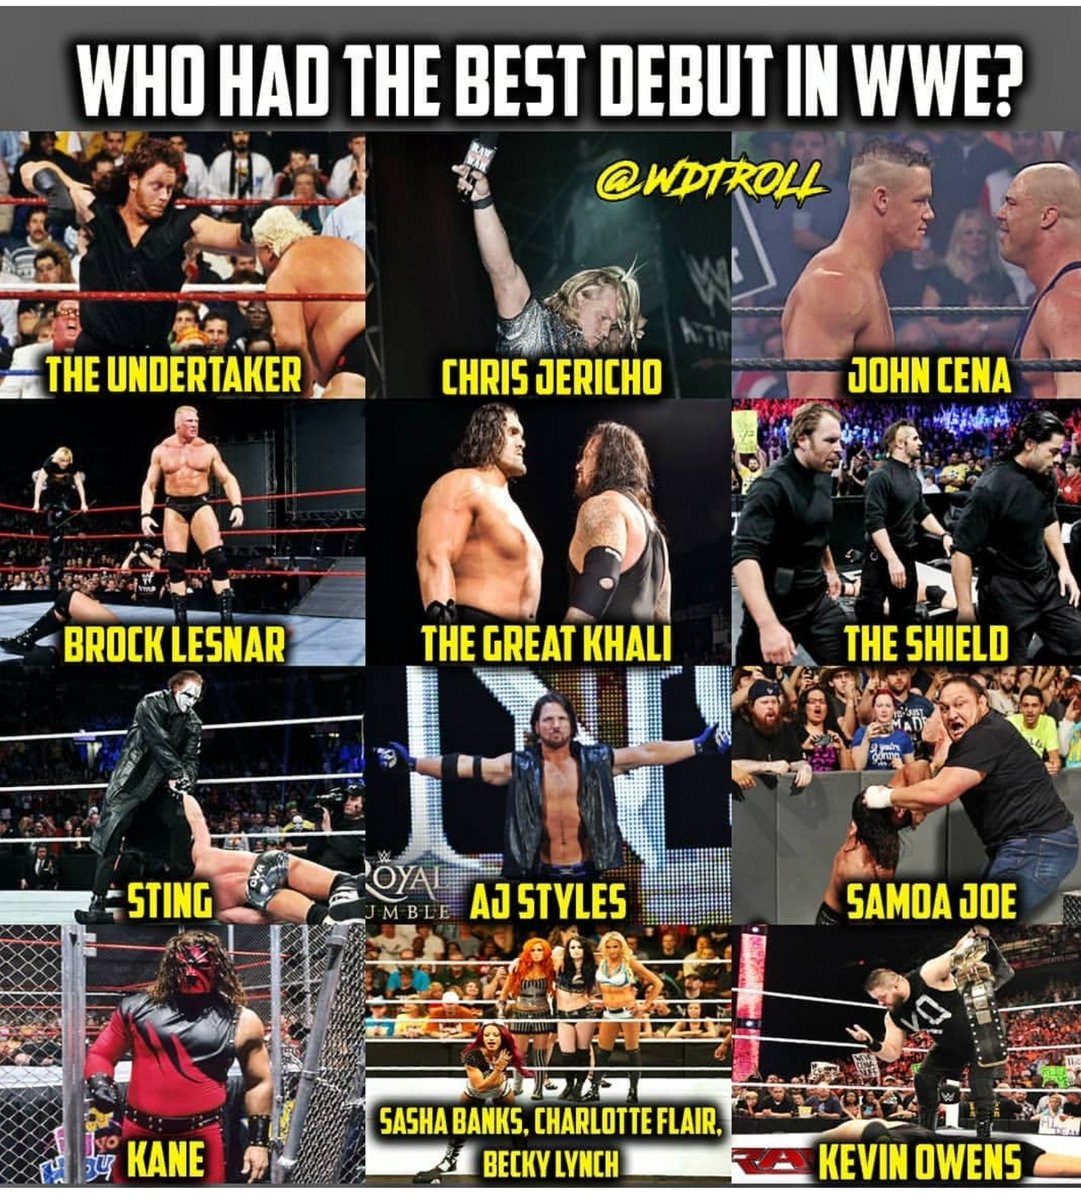 Wrestling Fans its #FollowFriday Turn on Notifications! Grow the #wrestling community. #Follow everyone who #RT and #Like the tweet, including me. #IFB #FOLLOWBACK #followme #FollowTrain #SDLive #FF #WWETLC #RAW #WrestlingCommunity #TMARMY #wwe #WWENXT #WWESuperCard